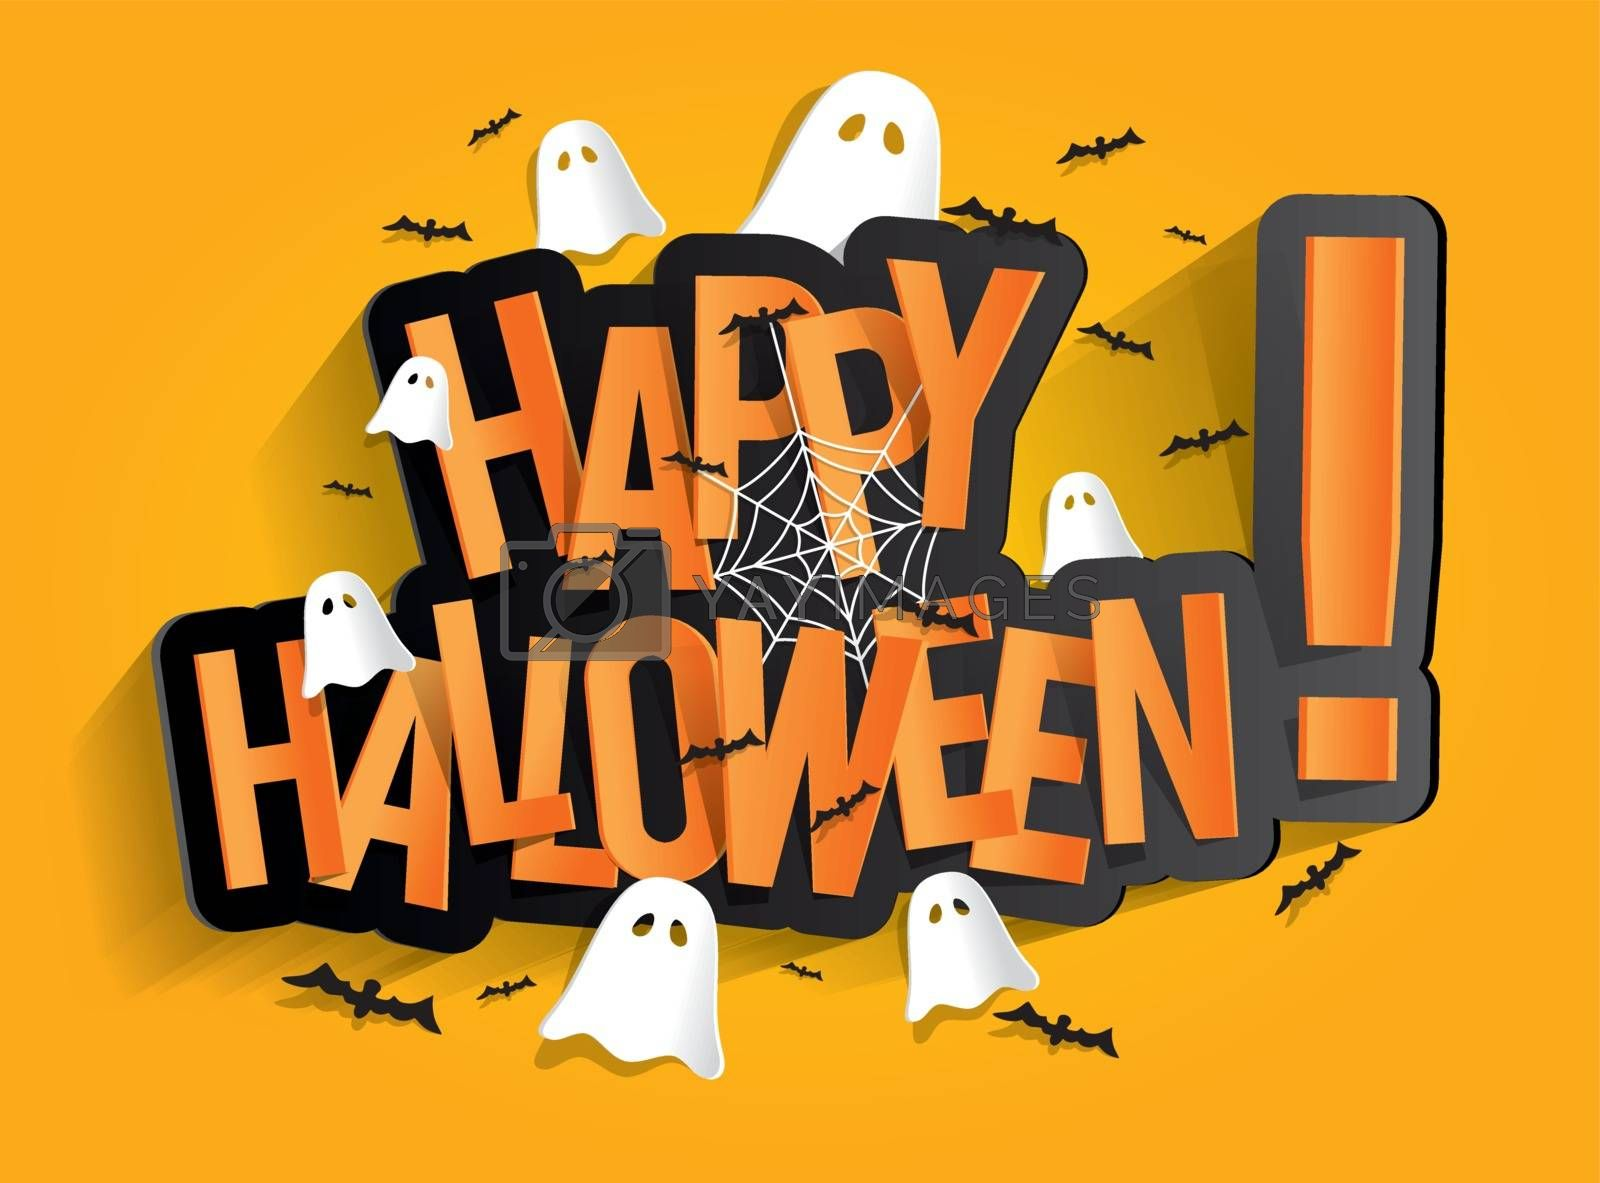 Happy Halloween Card Design Elements On Background, vector illustration